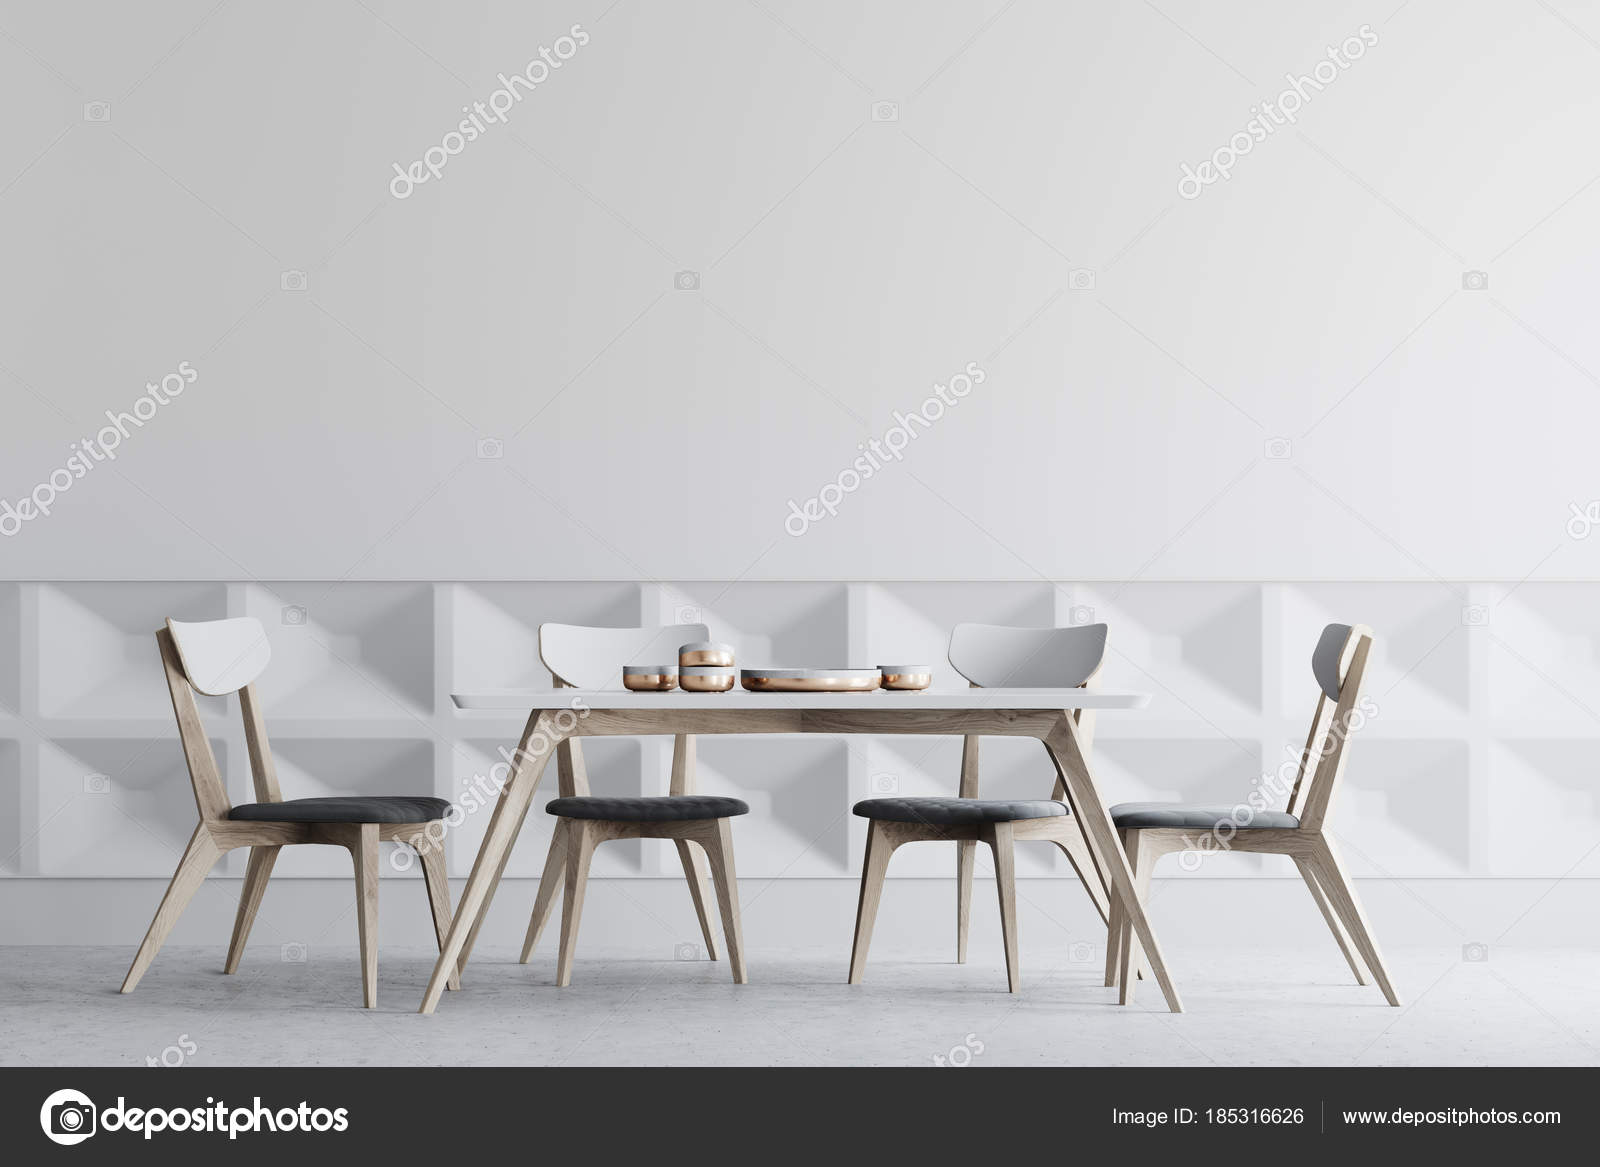 Sedie Bianche E Legno : Sala da pranzo interni in legno sedie bianche u2014 foto stock